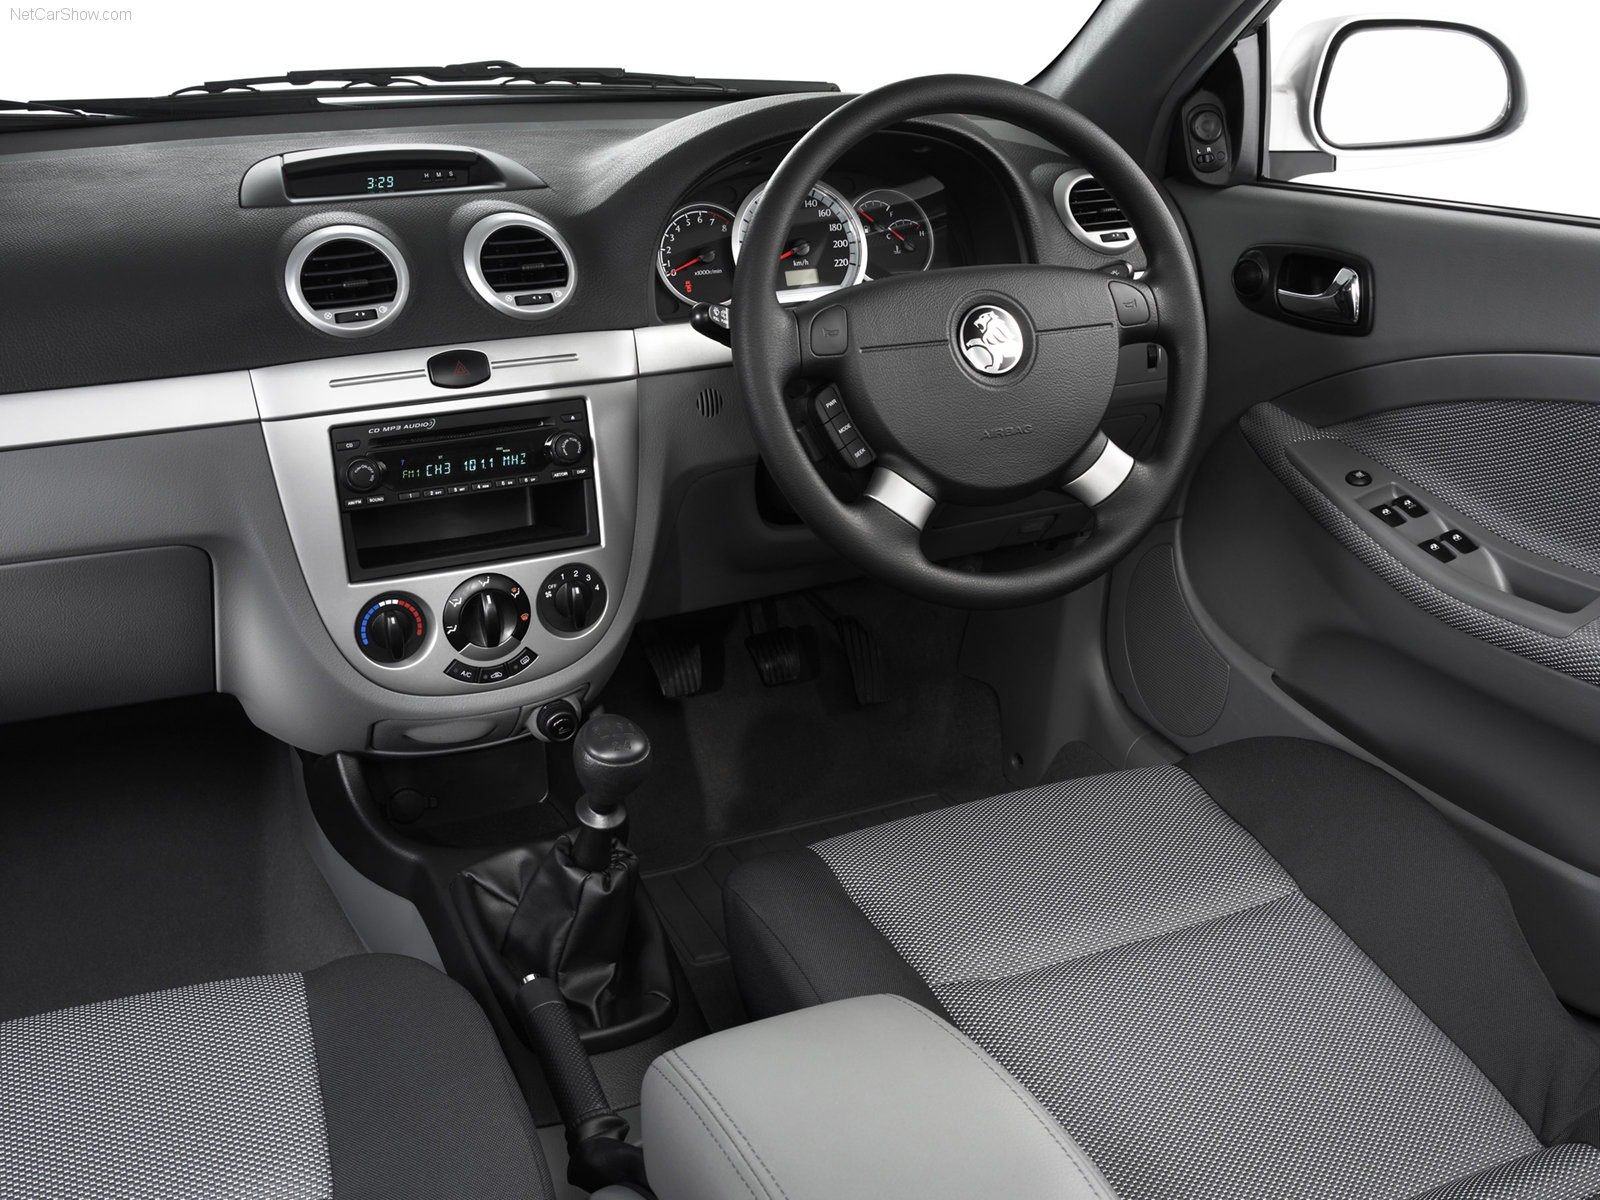 Holden jf viva wagon photos photogallery with 7 pics carsbase 377kb 1600 x 1200 79 vanachro Choice Image